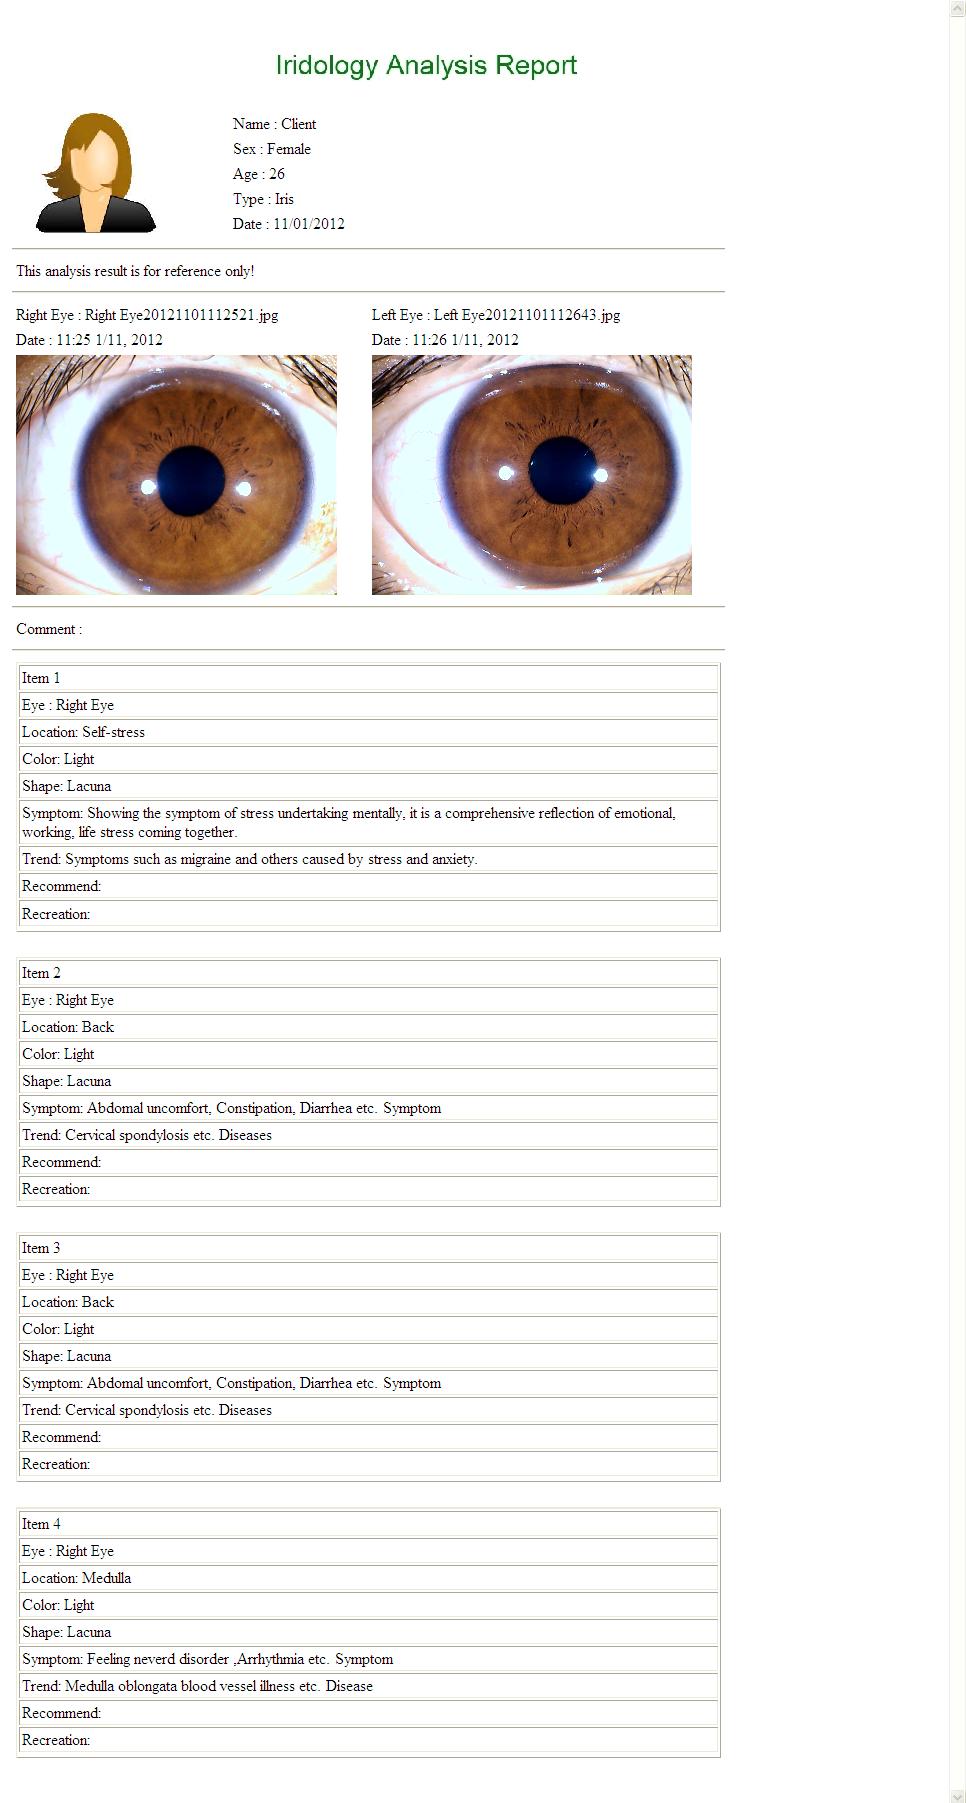 iridology reading report 3